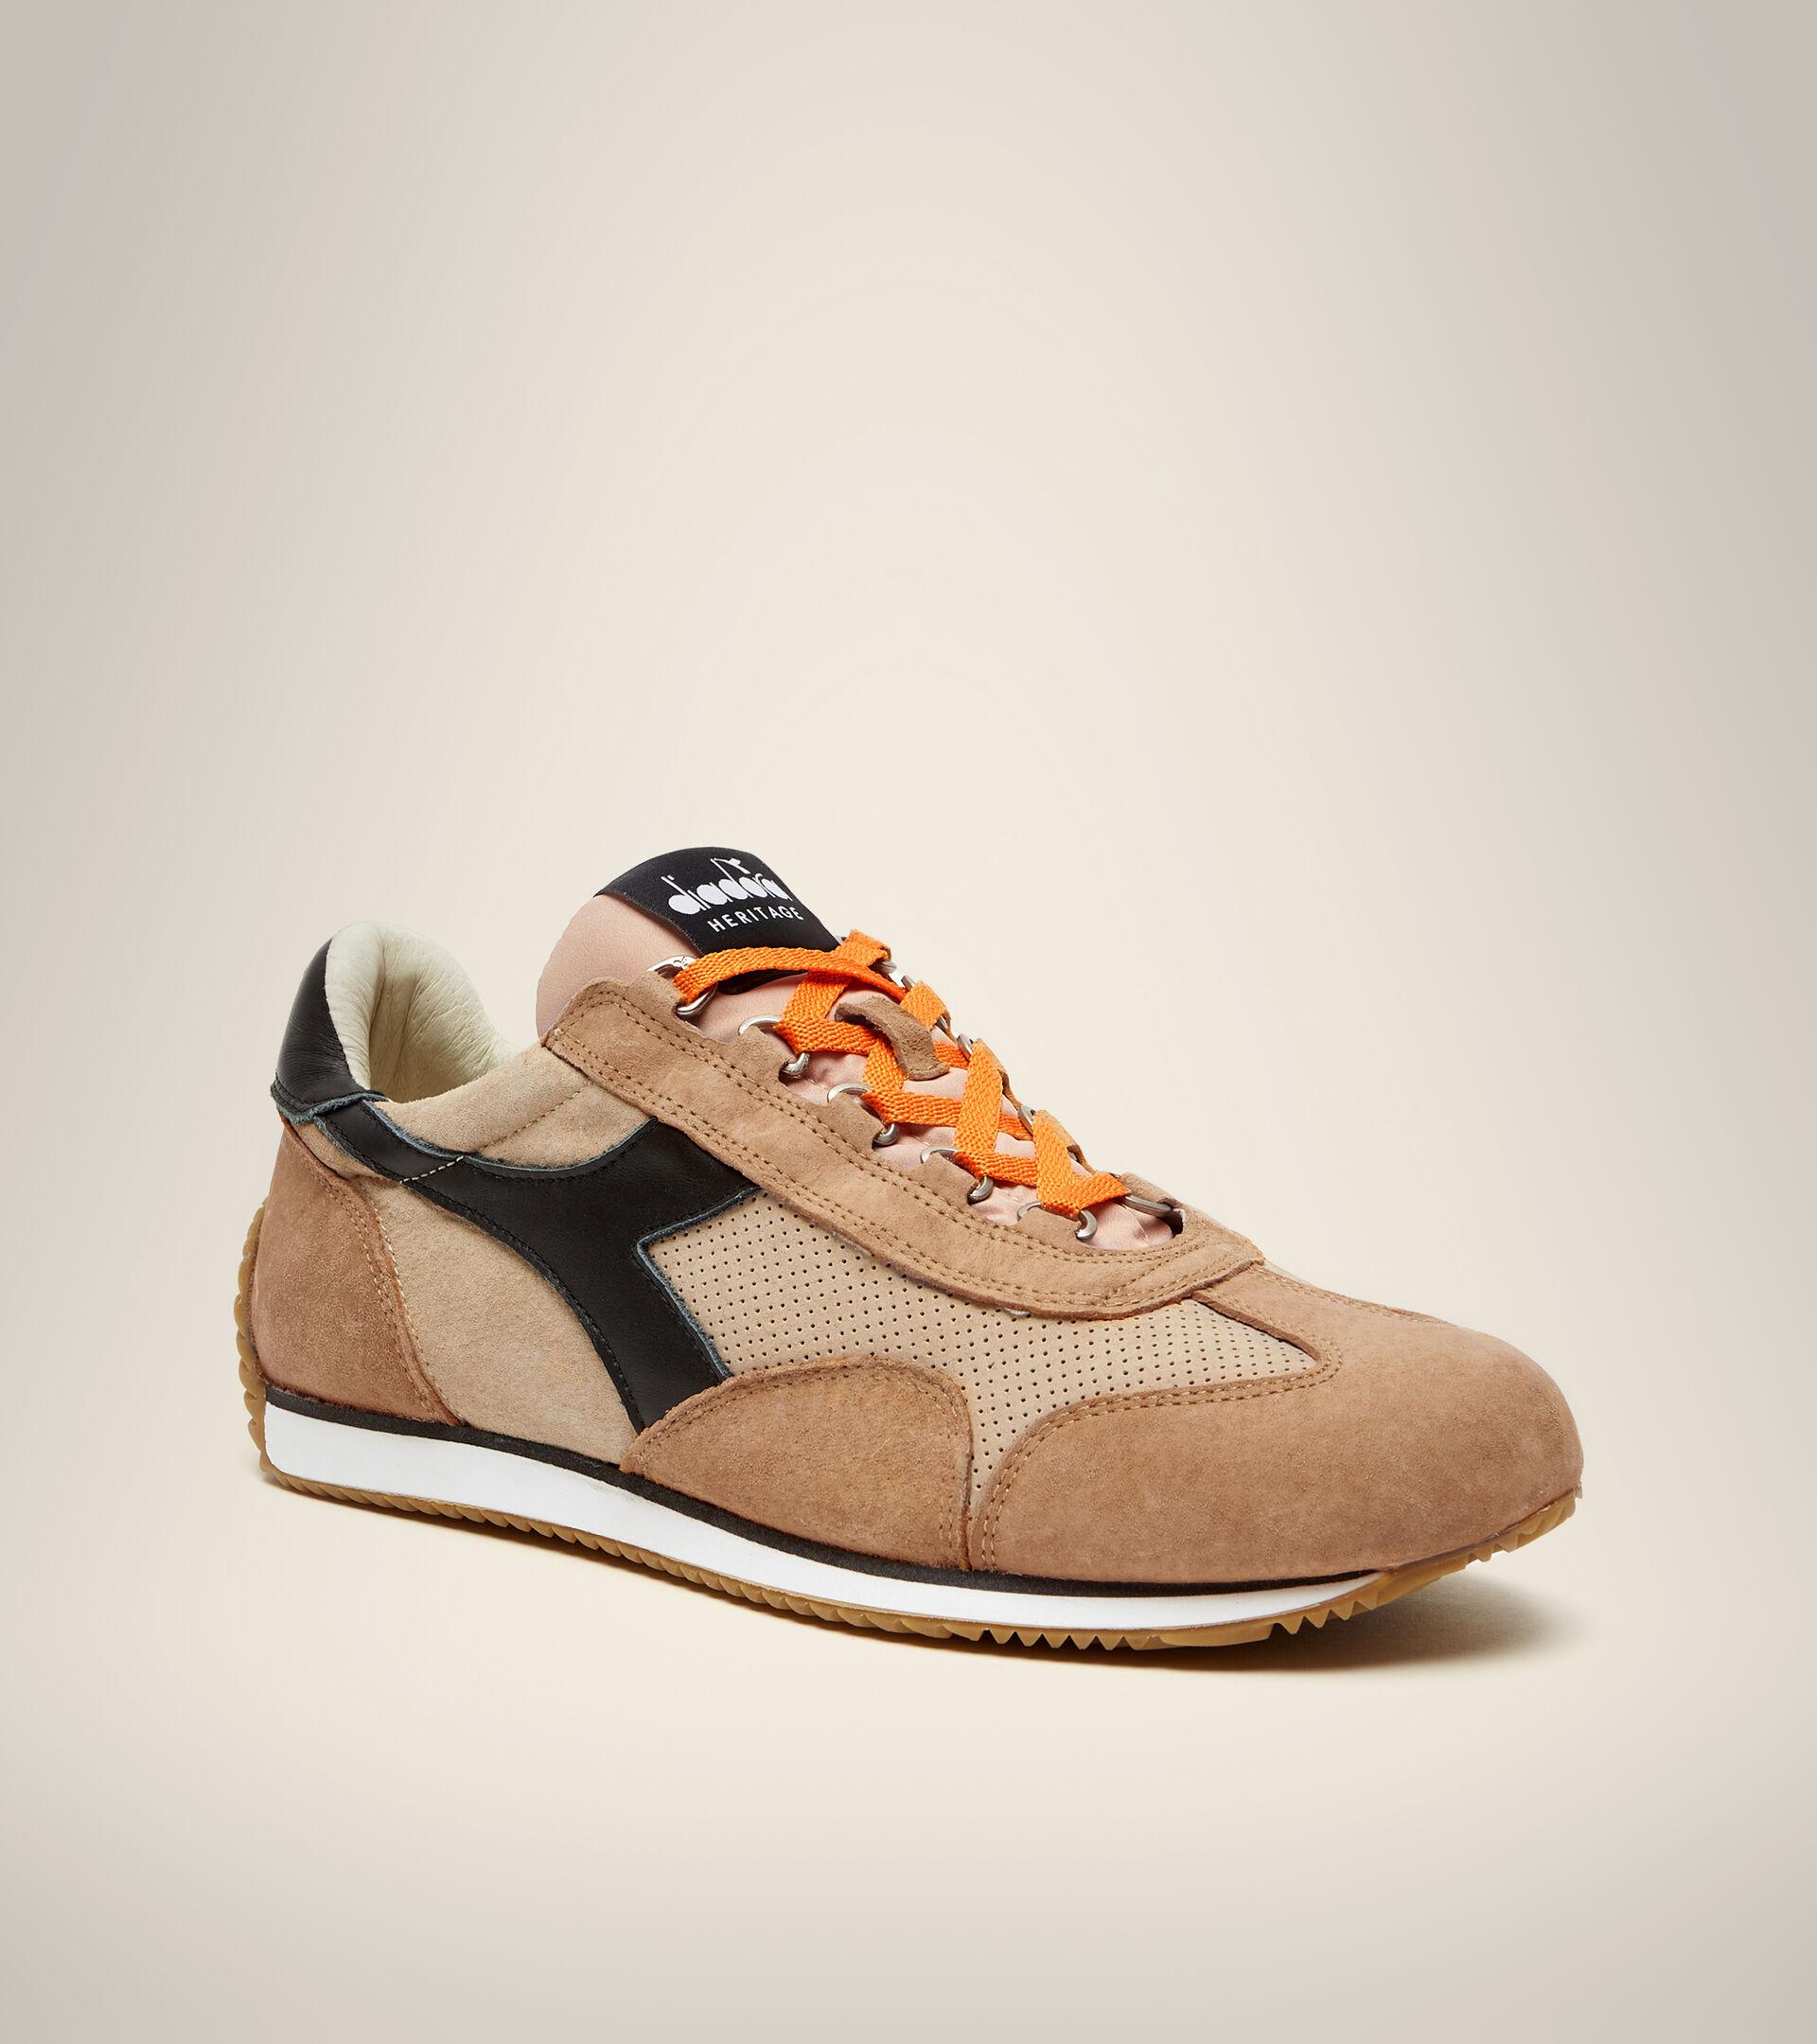 Heritage-Sneaker - Unisex  EQUIPE SUEDE SW DESERT MIST - Diadora